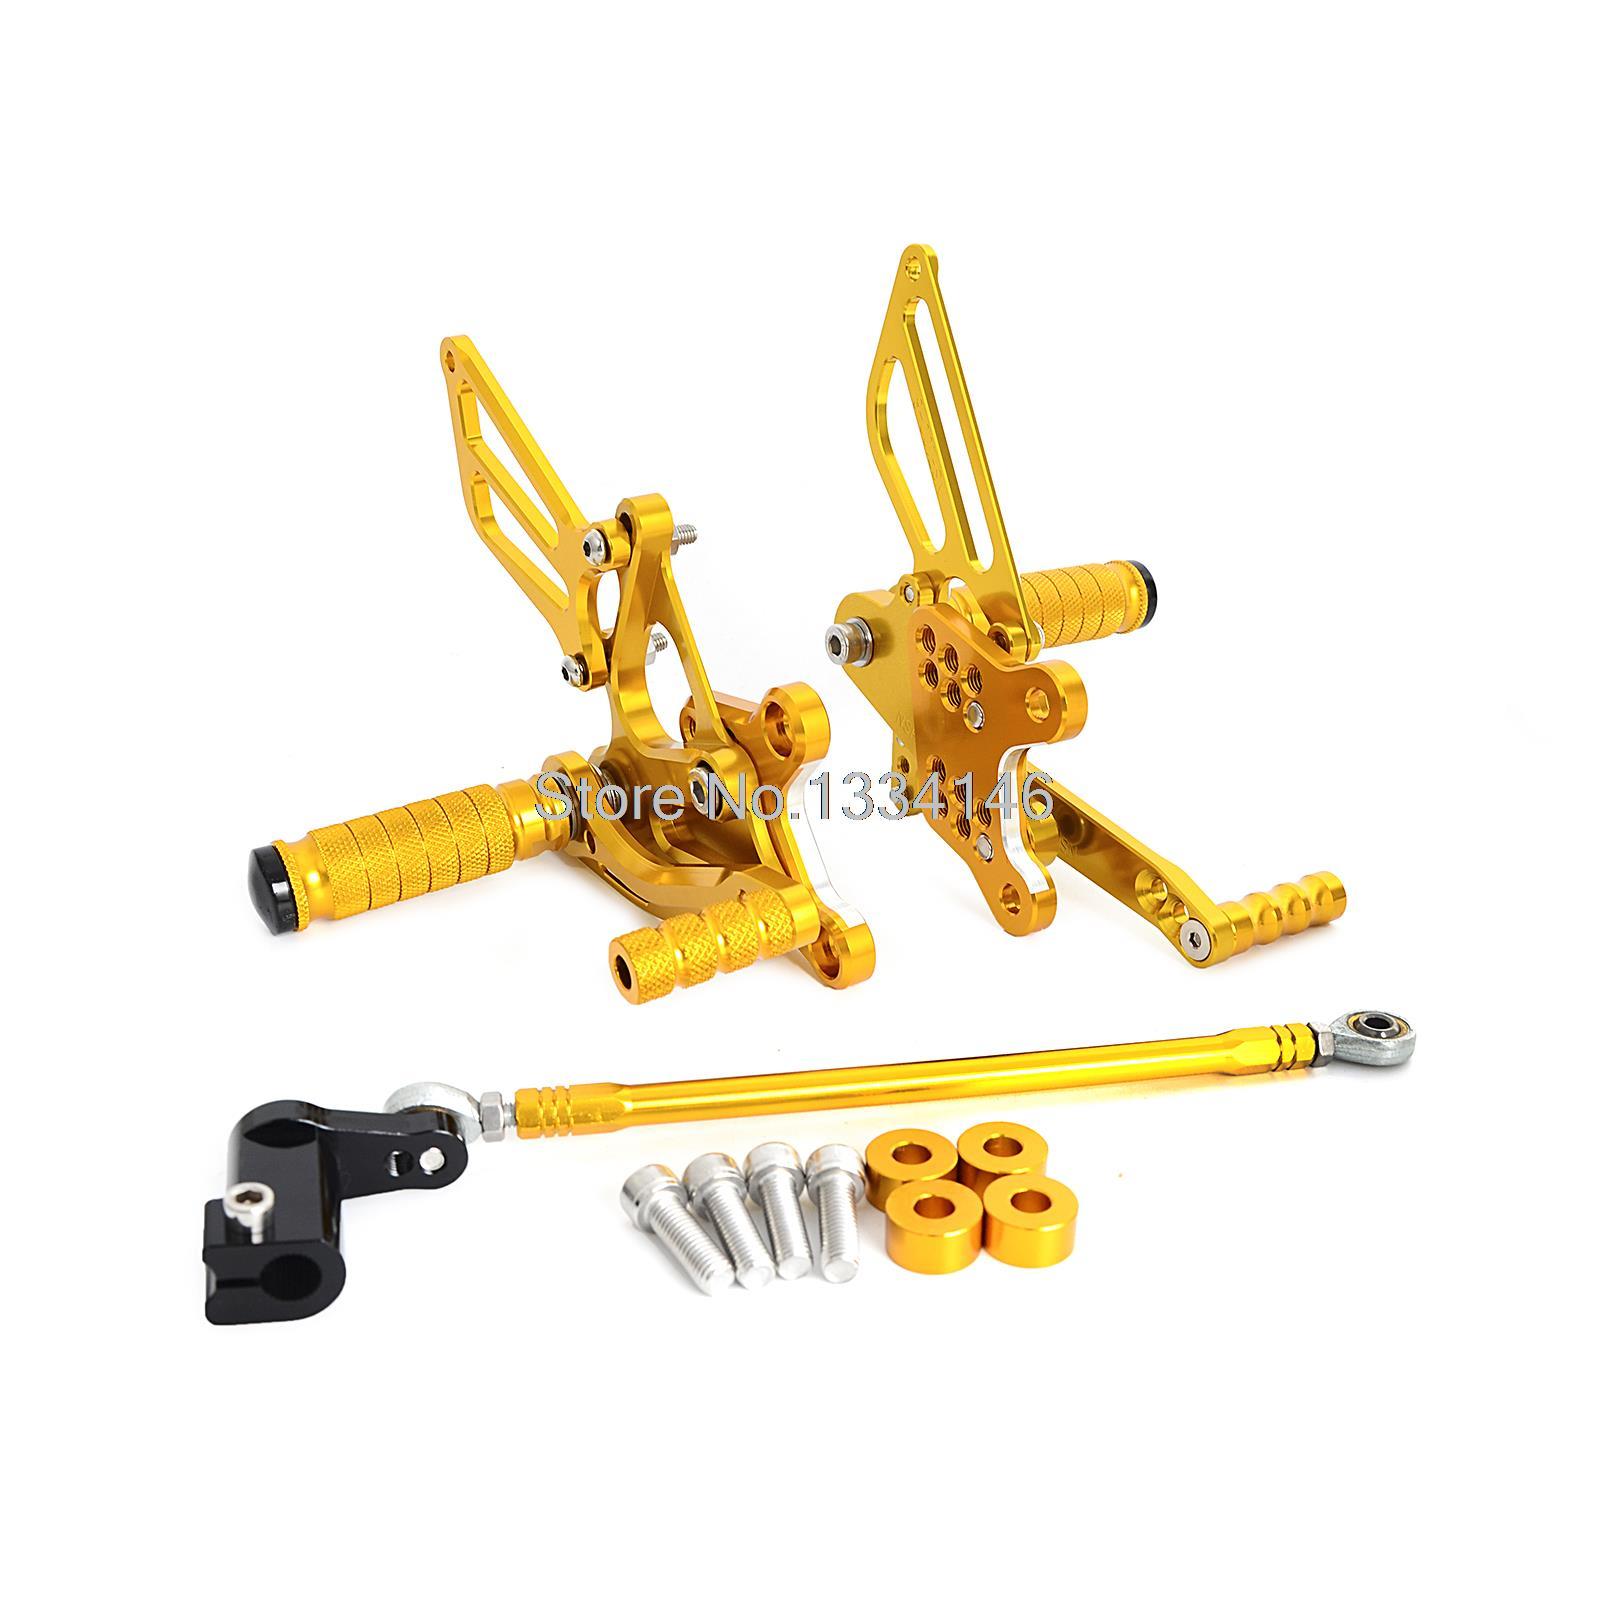 Gold CNC Adjustable Rearset Foot Peg Rear Sets For Honda CBR929 CBR929RR 2001 2002 l r pillion foot peg for honda c70 ct90 cb125 cb200 cg110 cg125 jx110 jx125 xl250 xl350